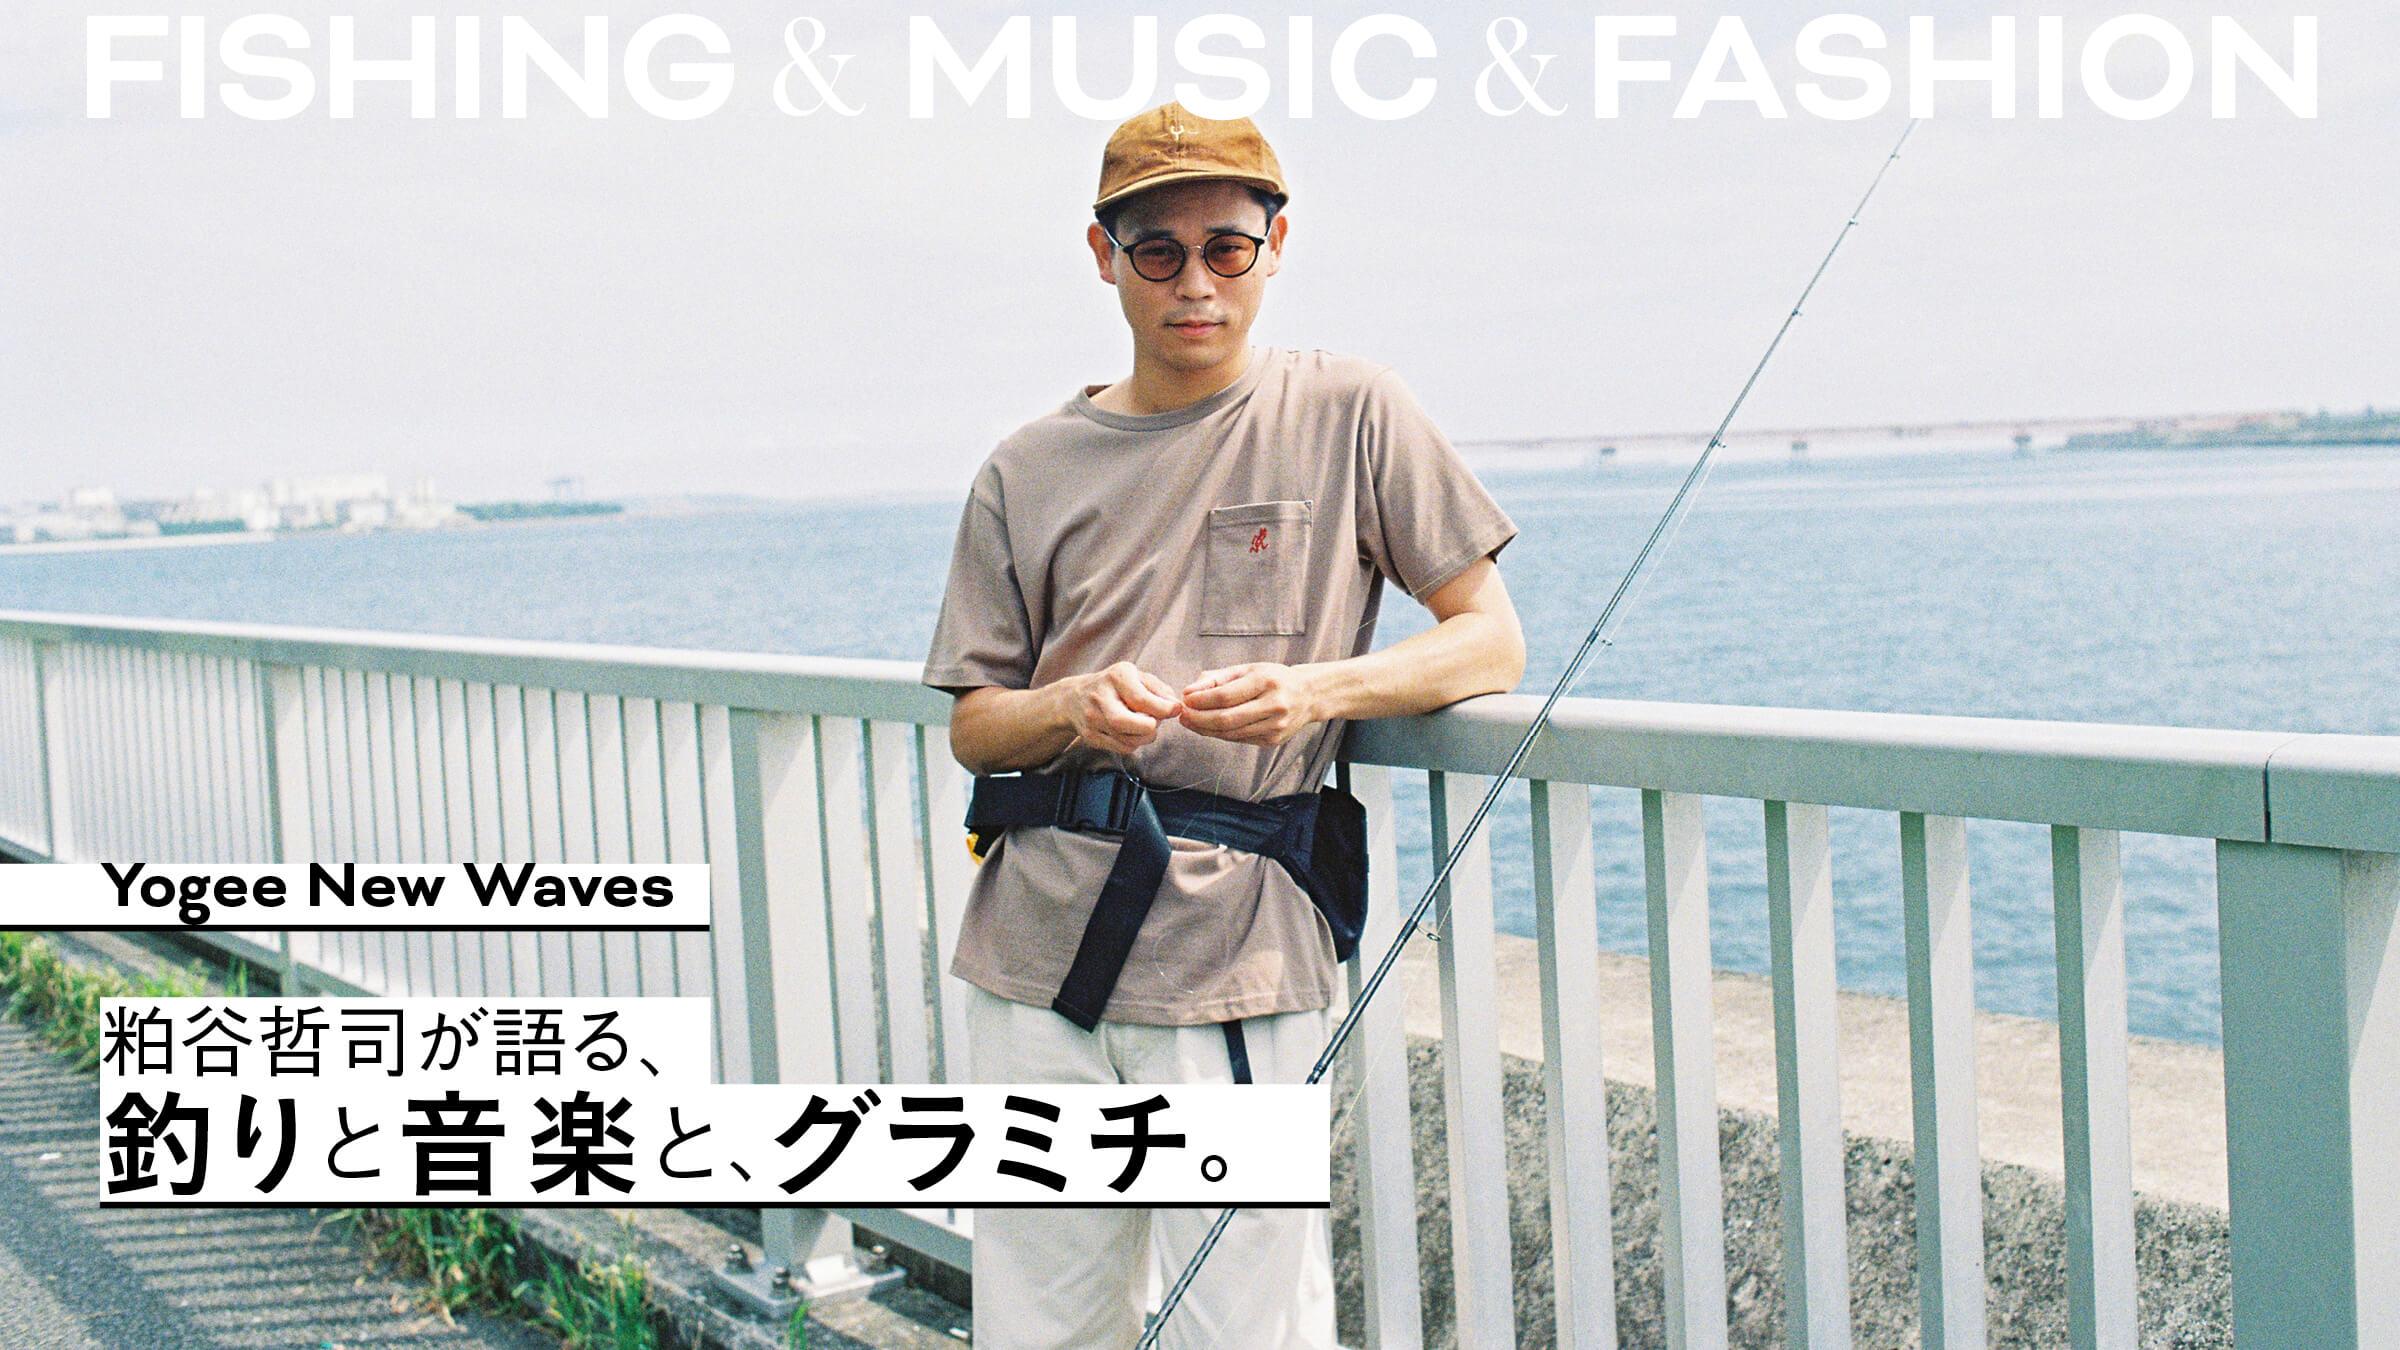 Yogee New Waves粕谷哲司が語る、釣りと音楽と、グラミチ。